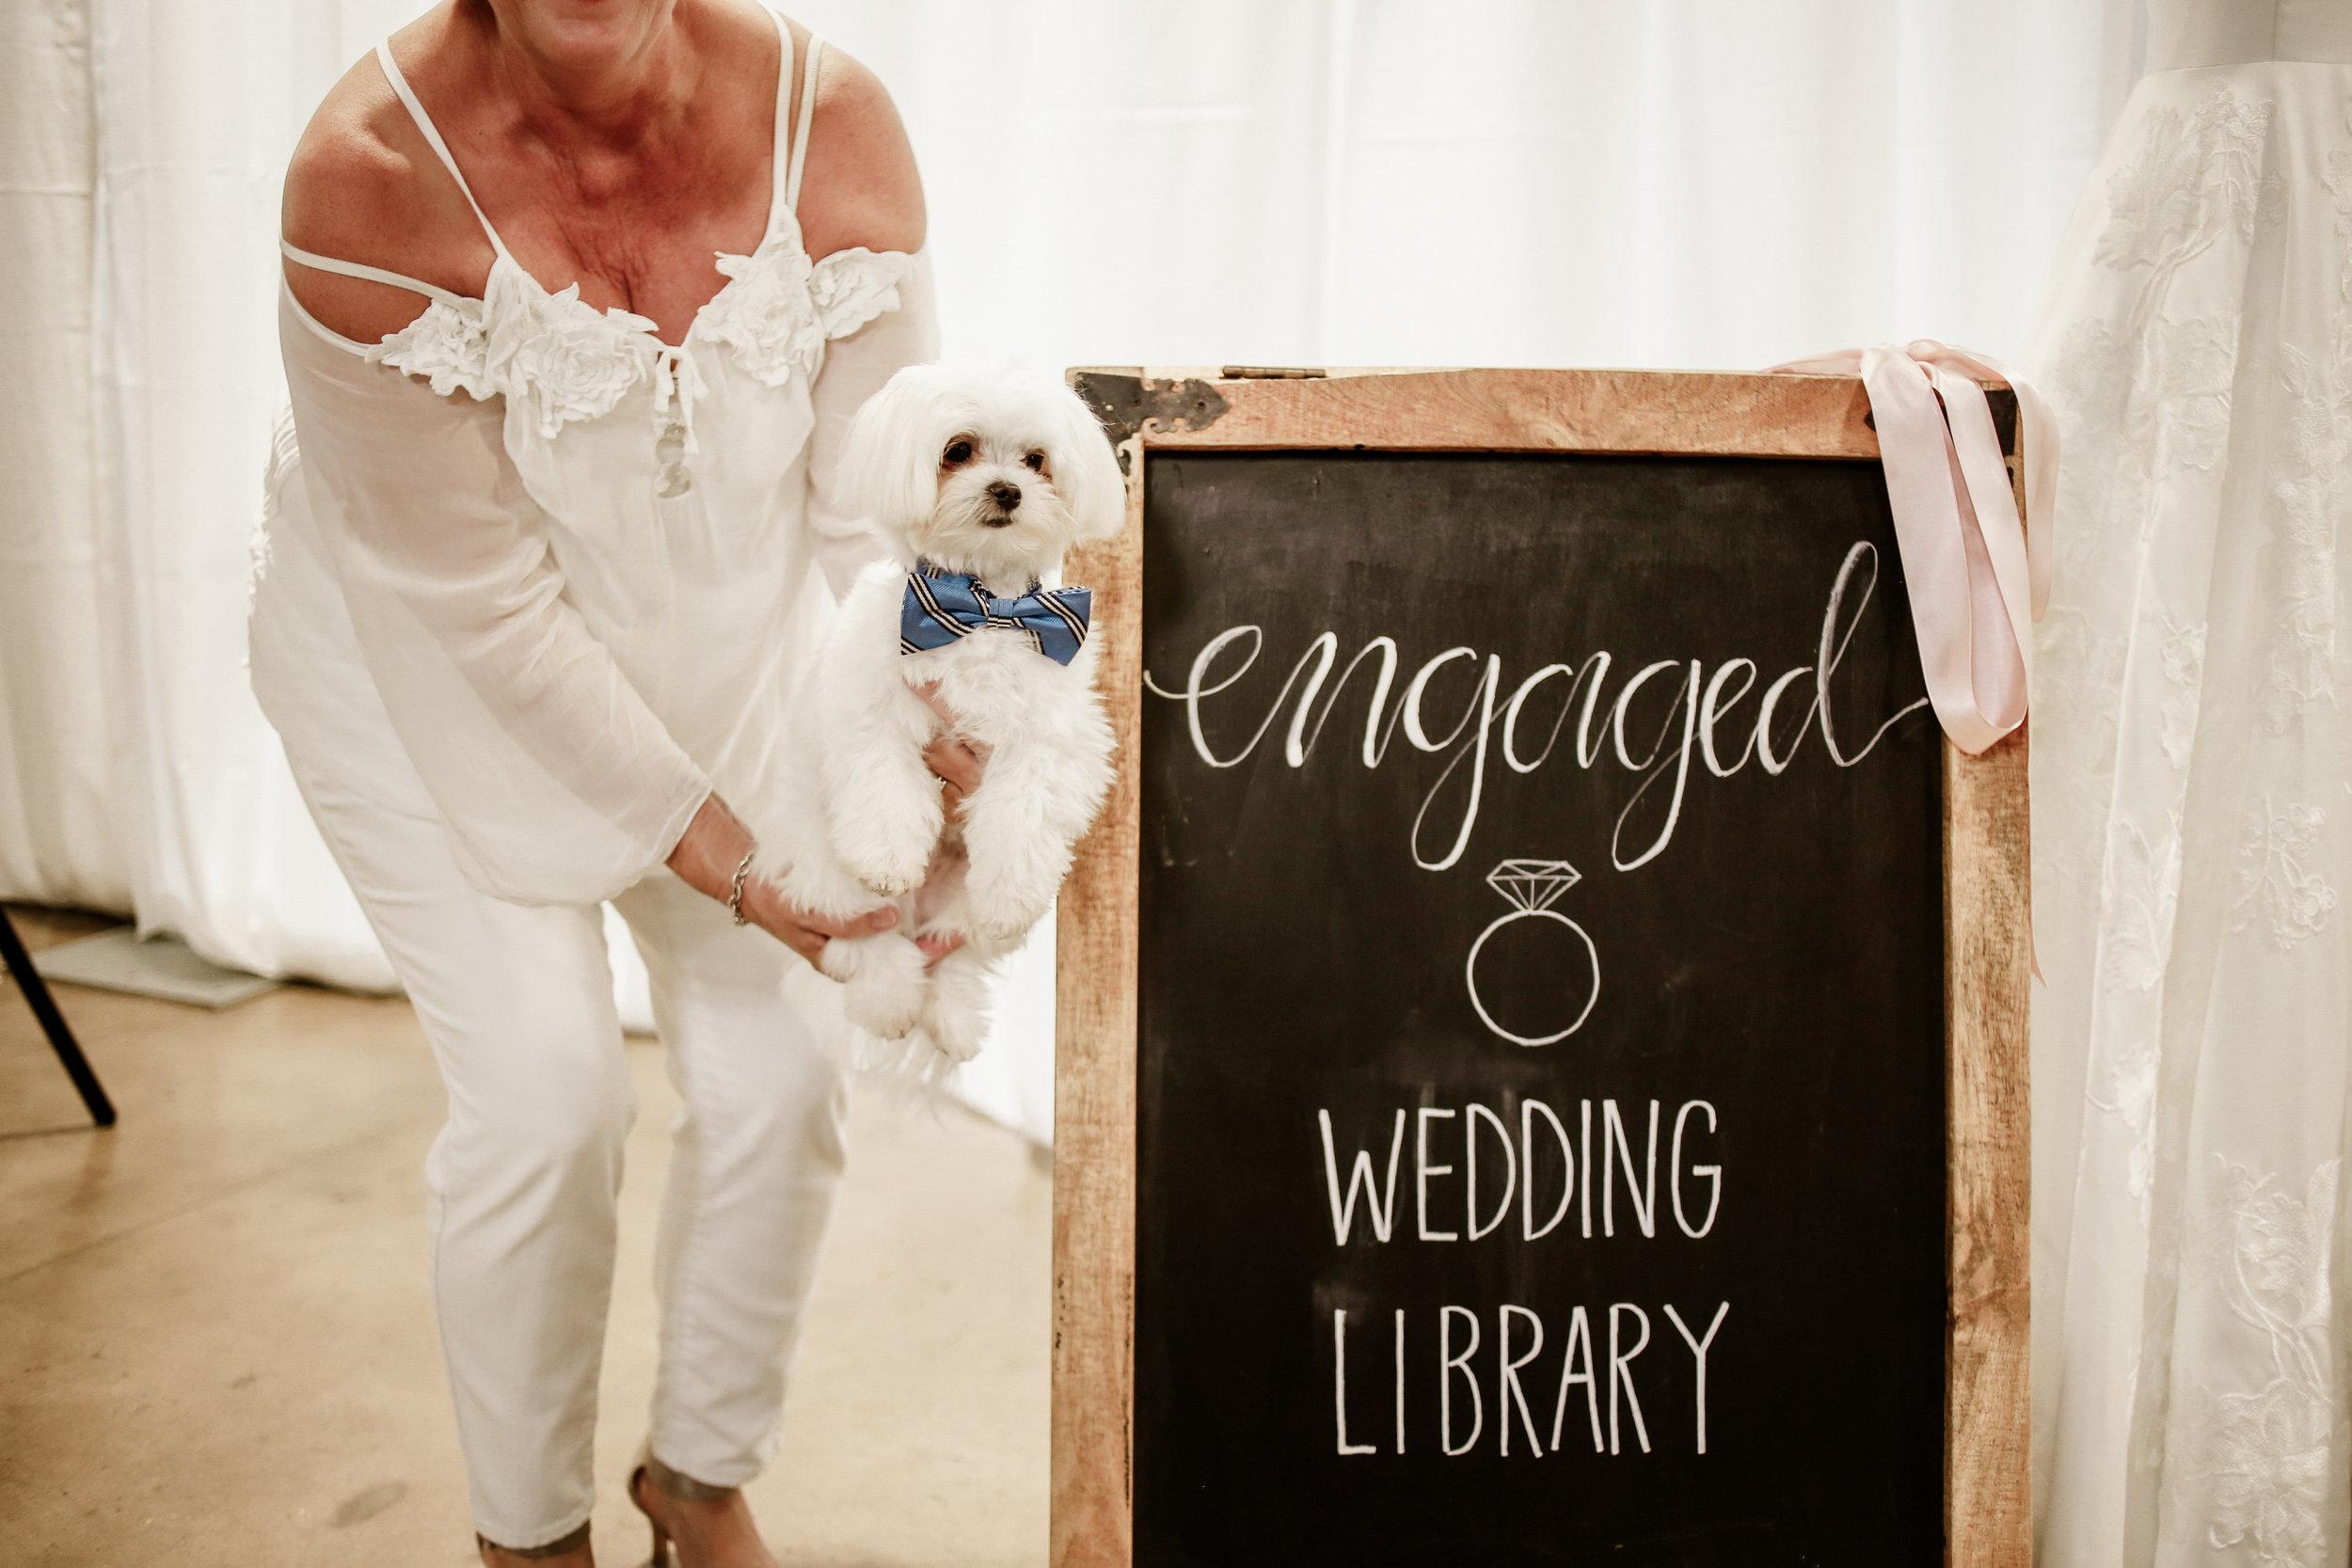 Engaged Event-Engaged Event-0274.jpg